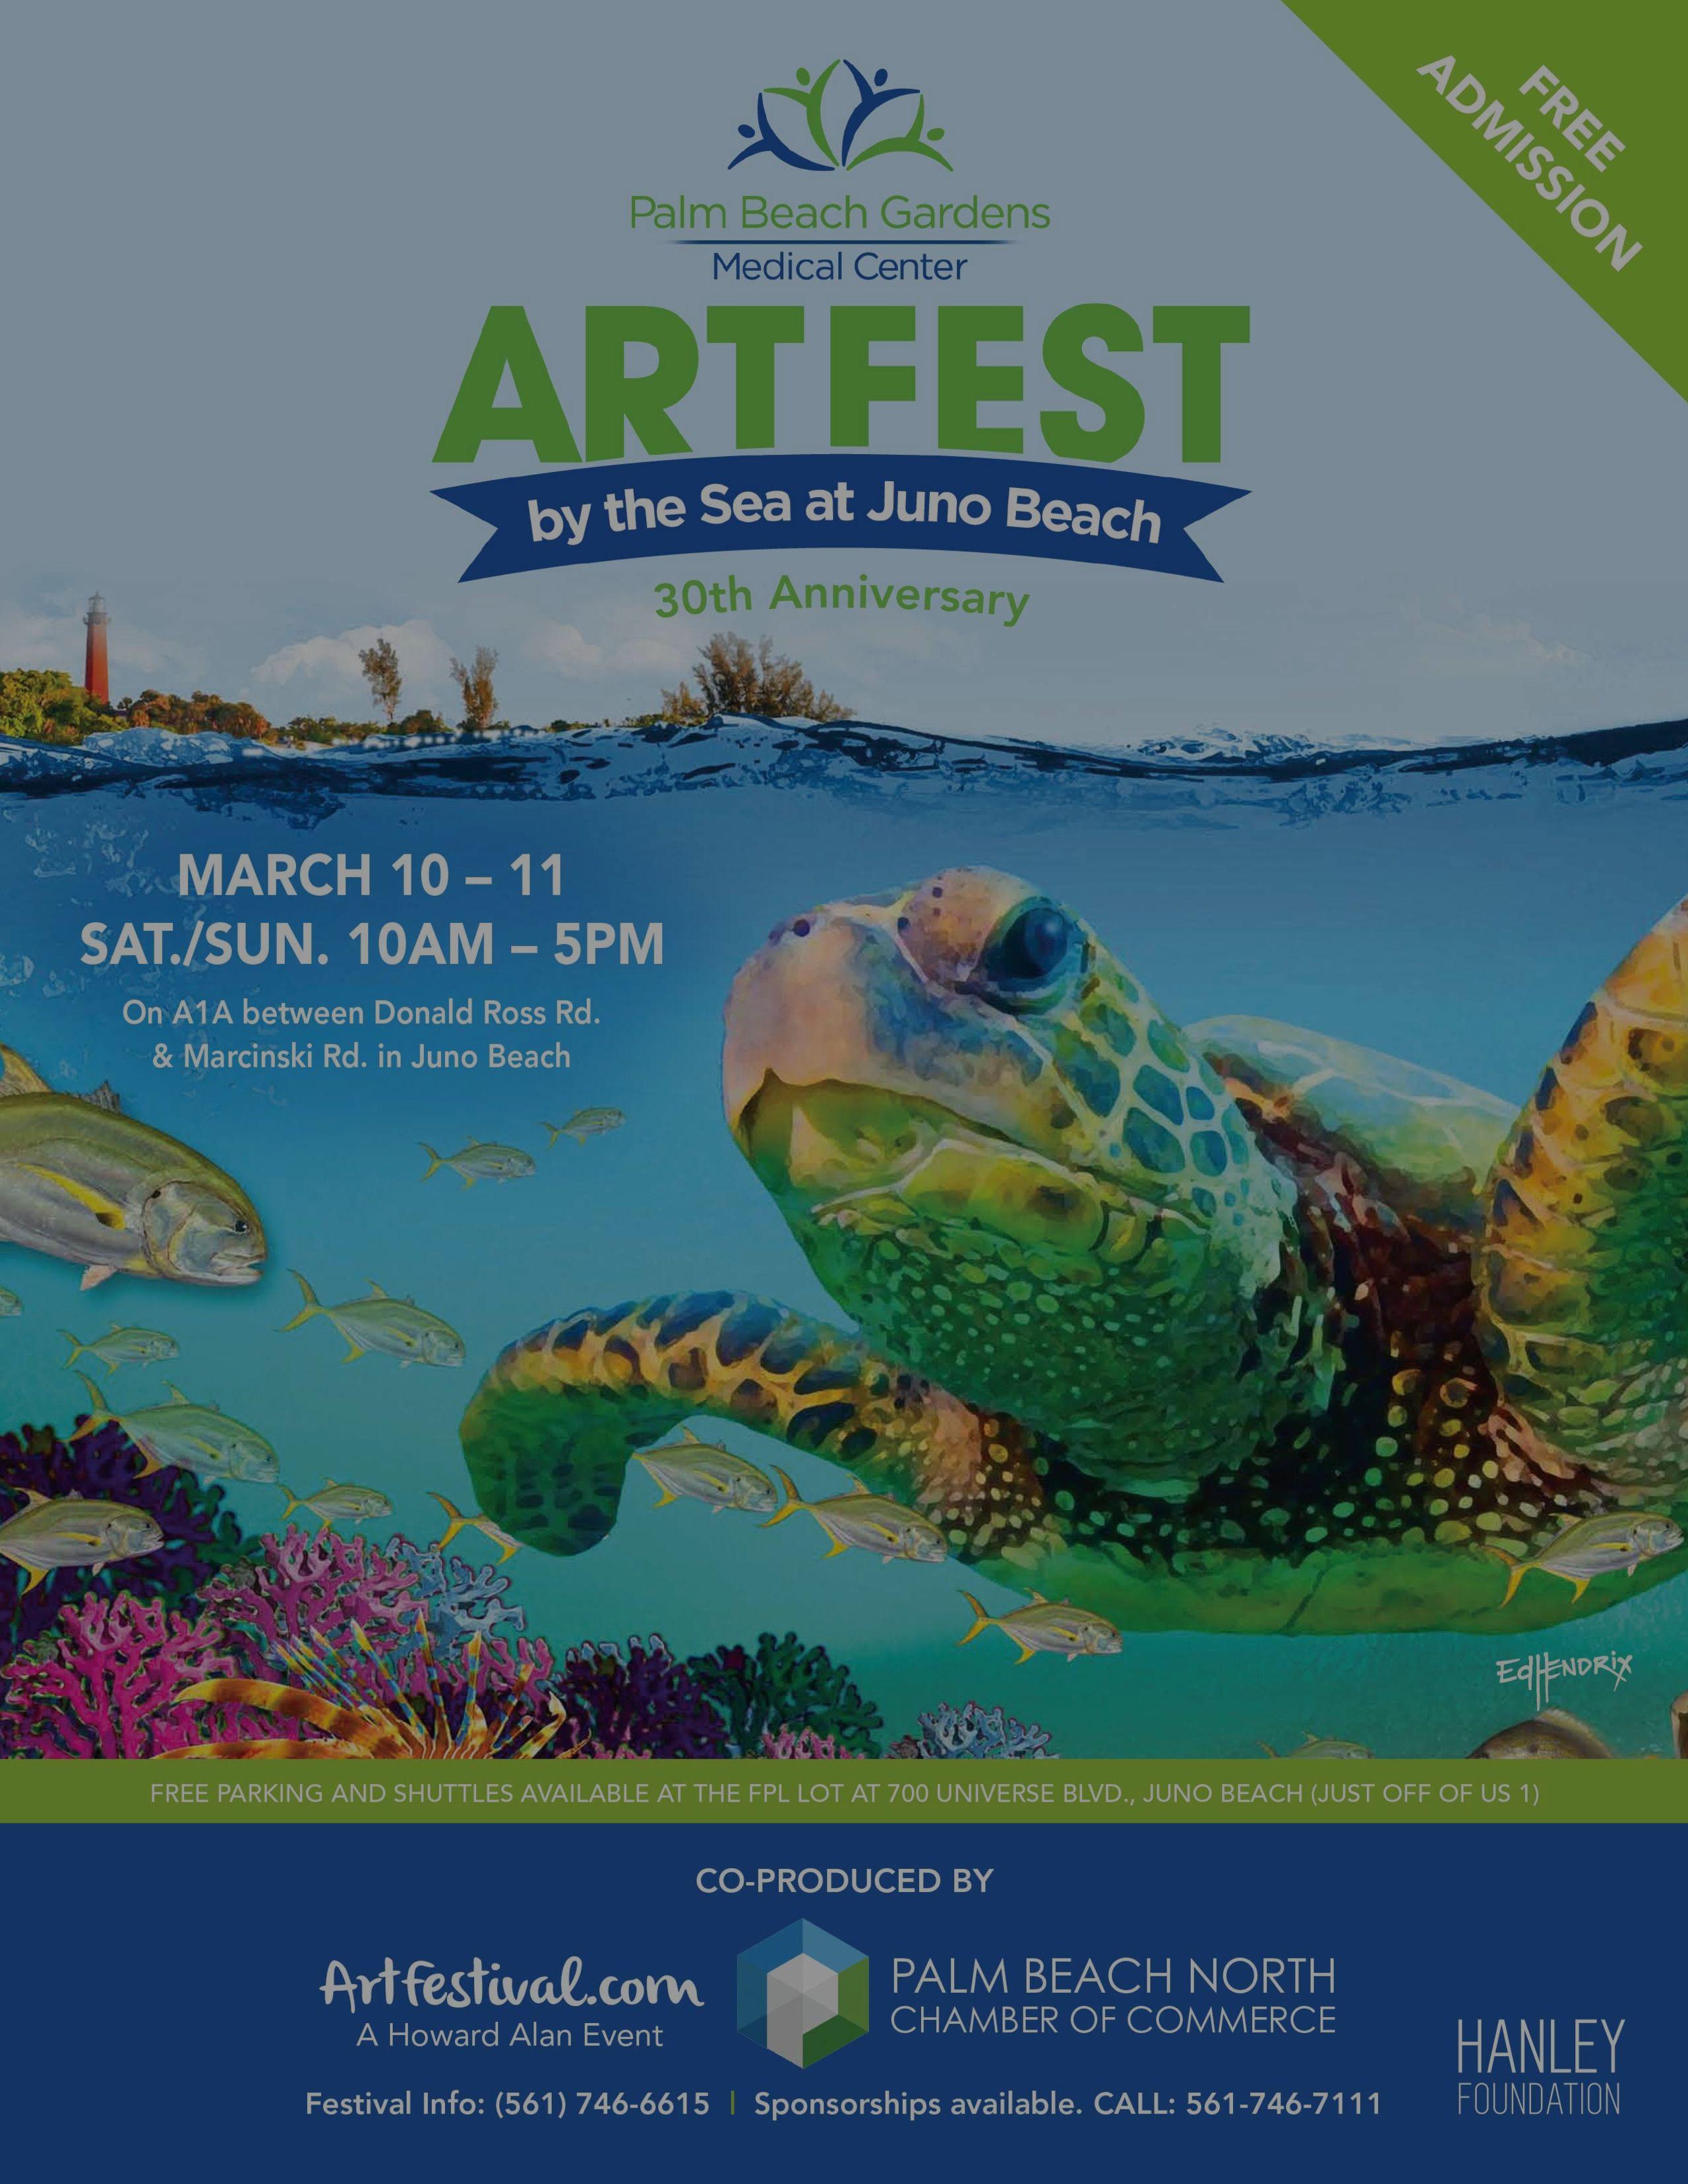 ArtFest by the Sea at Juno Beach